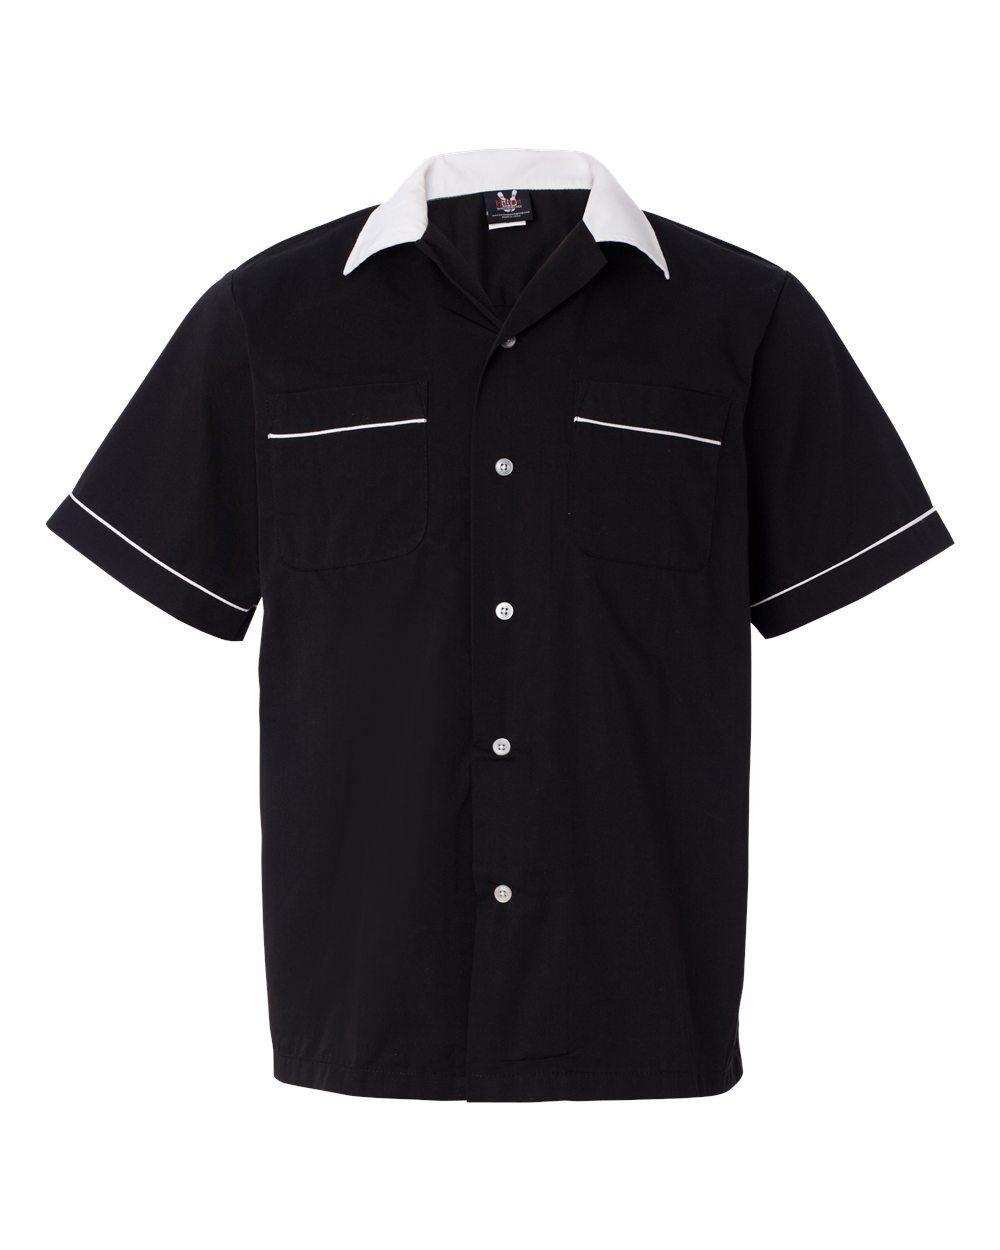 Callaway Womens Golf Shirts